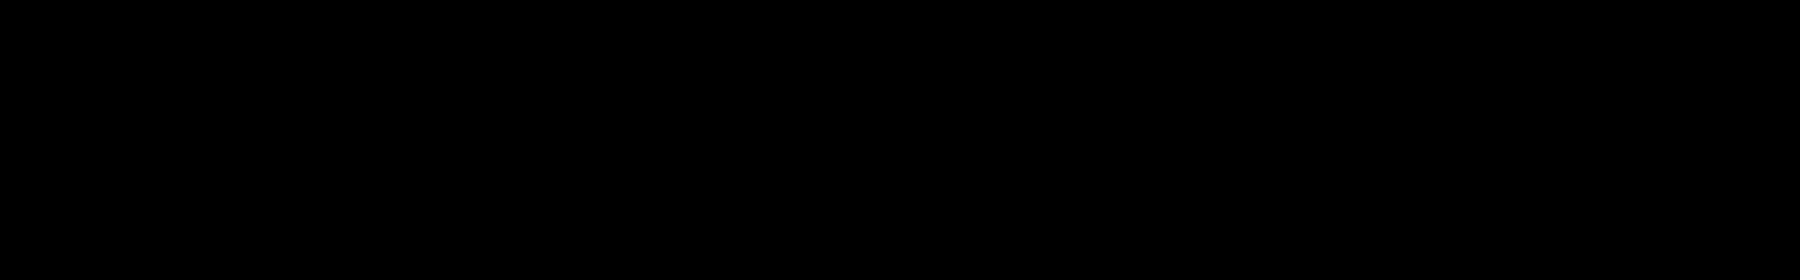 Basement Freaks Presents Melancholica audio waveform